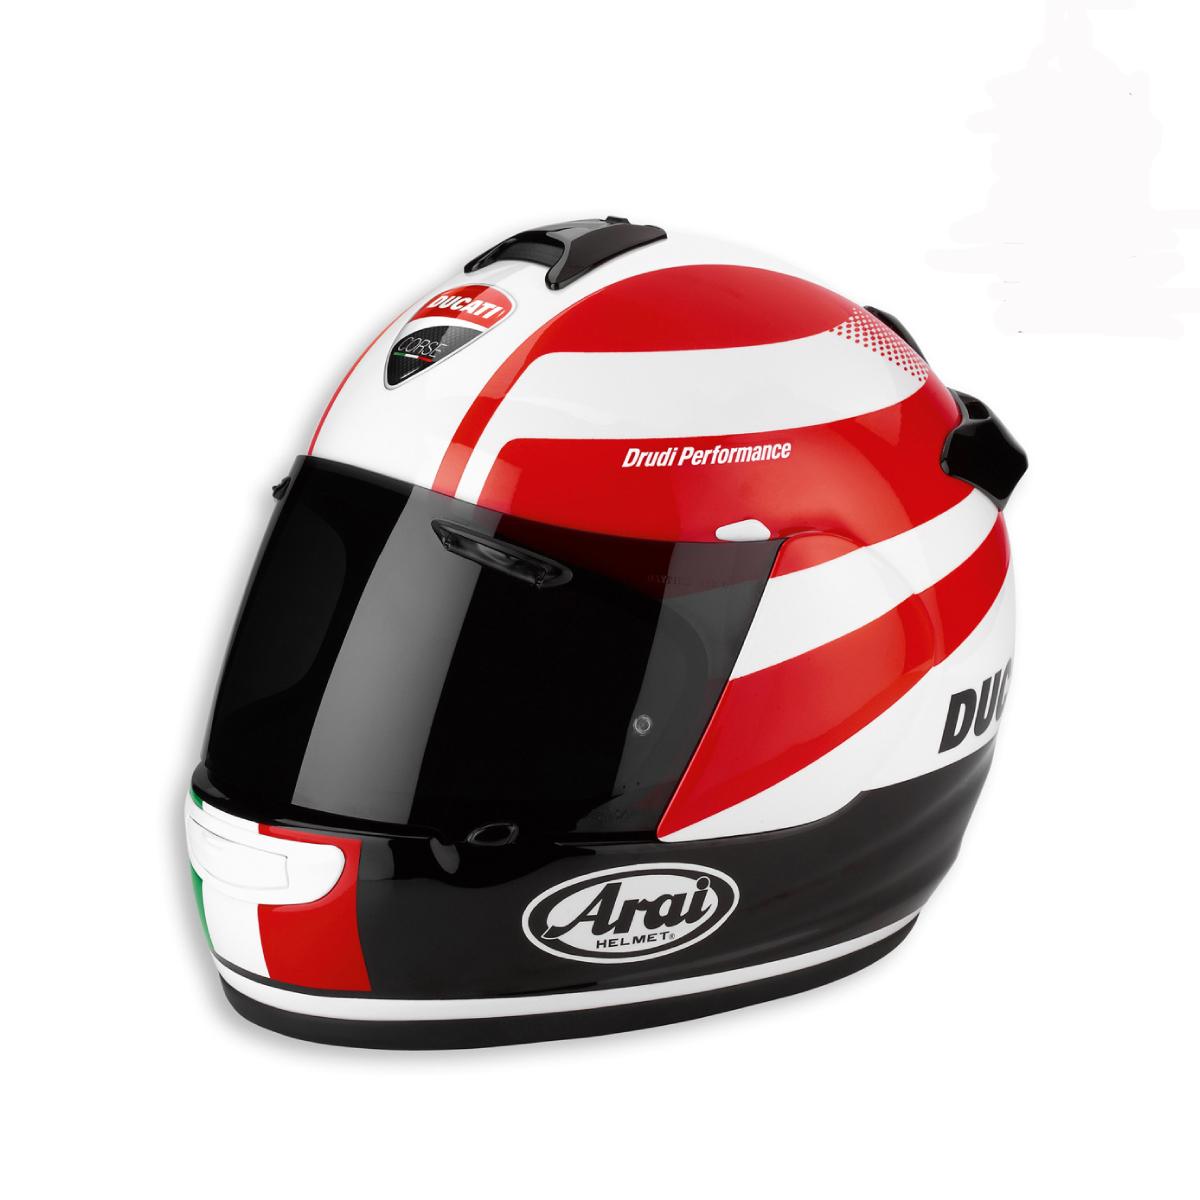 Ducati Corse SBK Helmet